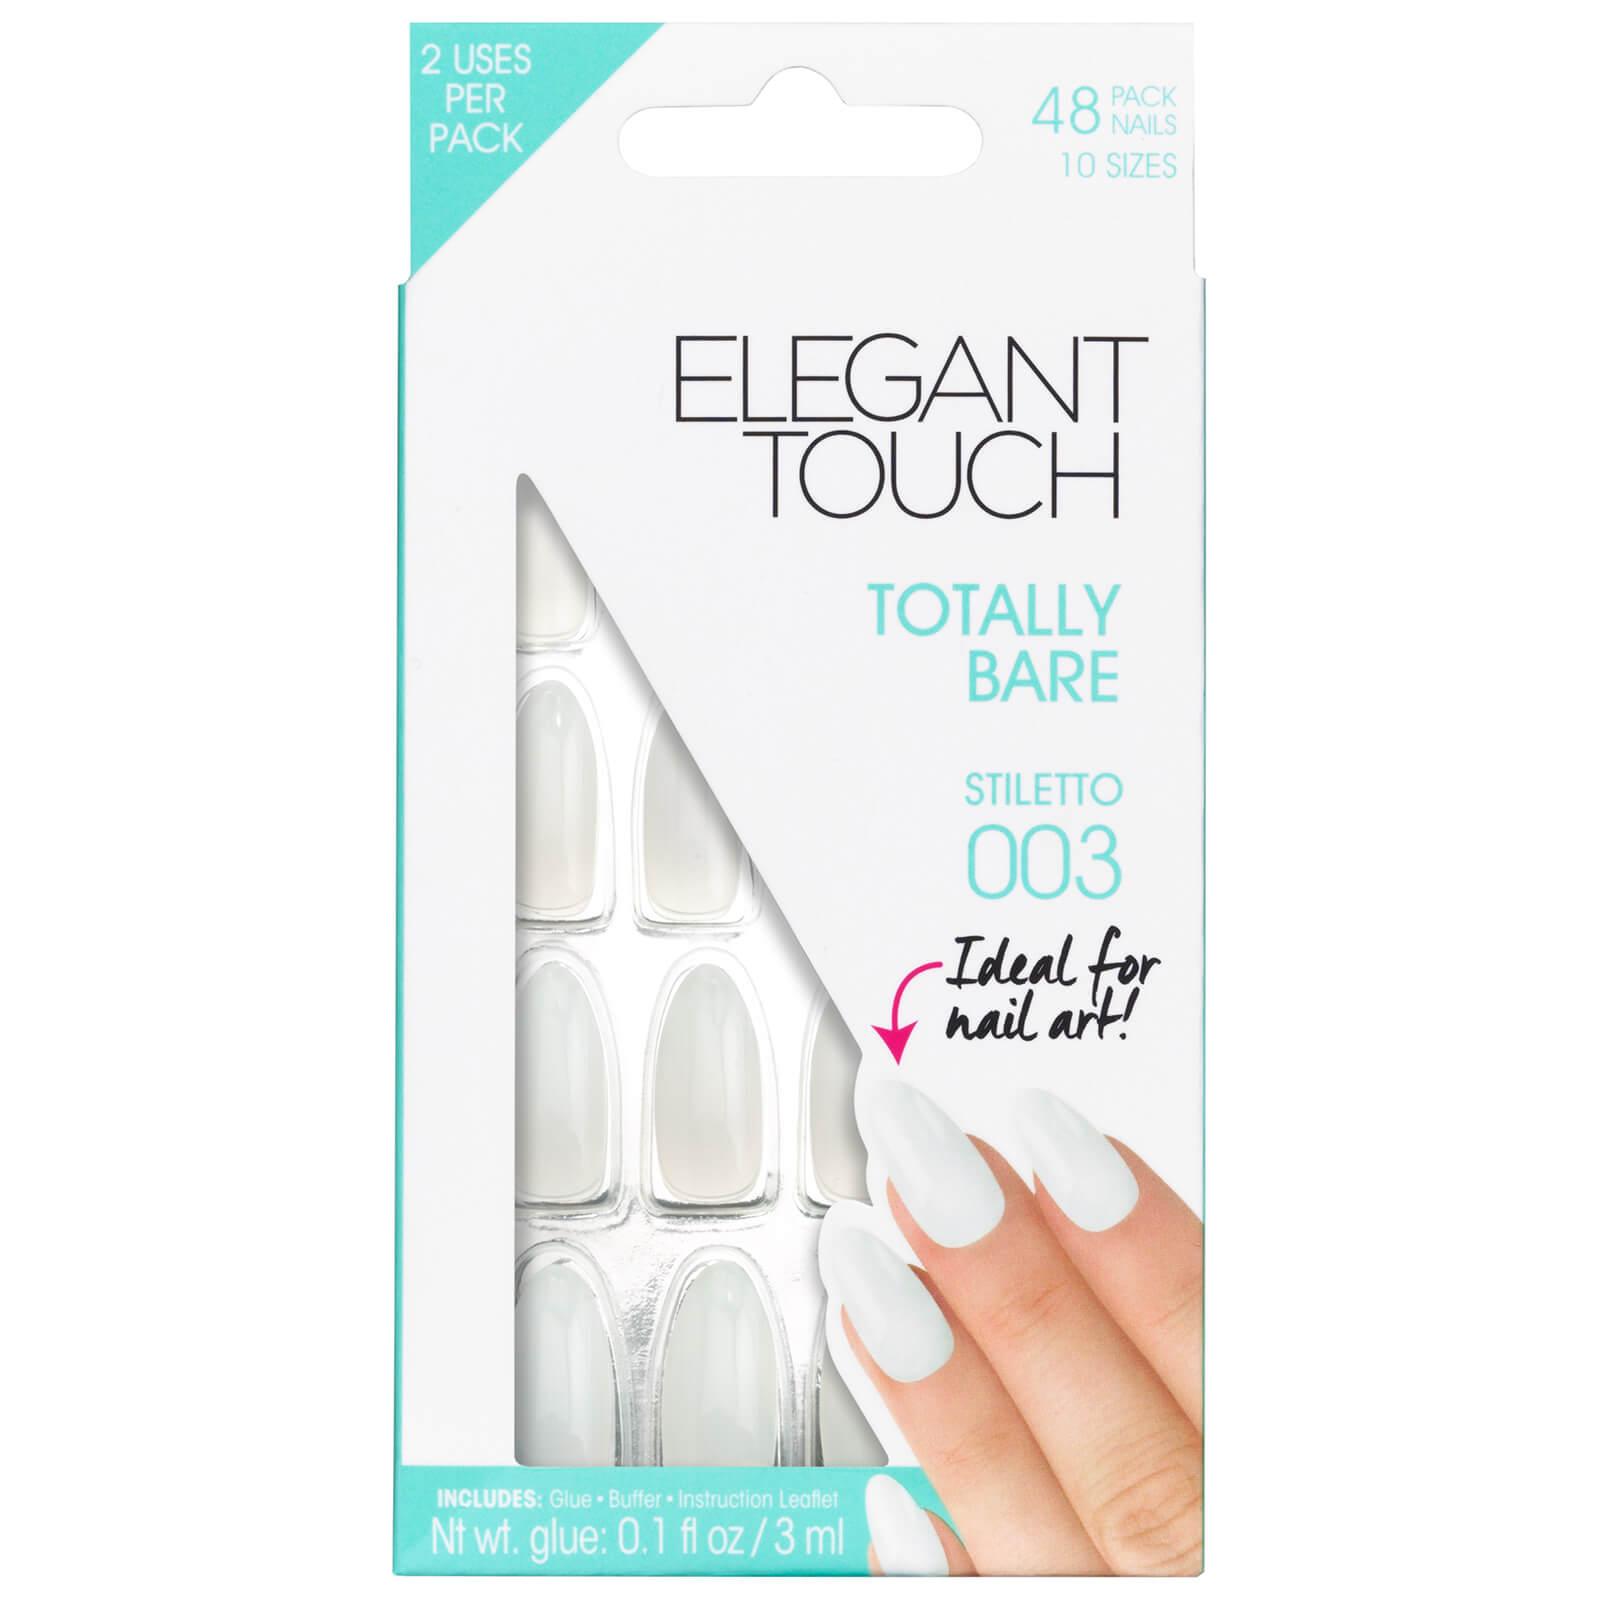 Накладные ногти без покрытия Elegant Touch Totally Bare Stiletto Nails— 003  - Купить